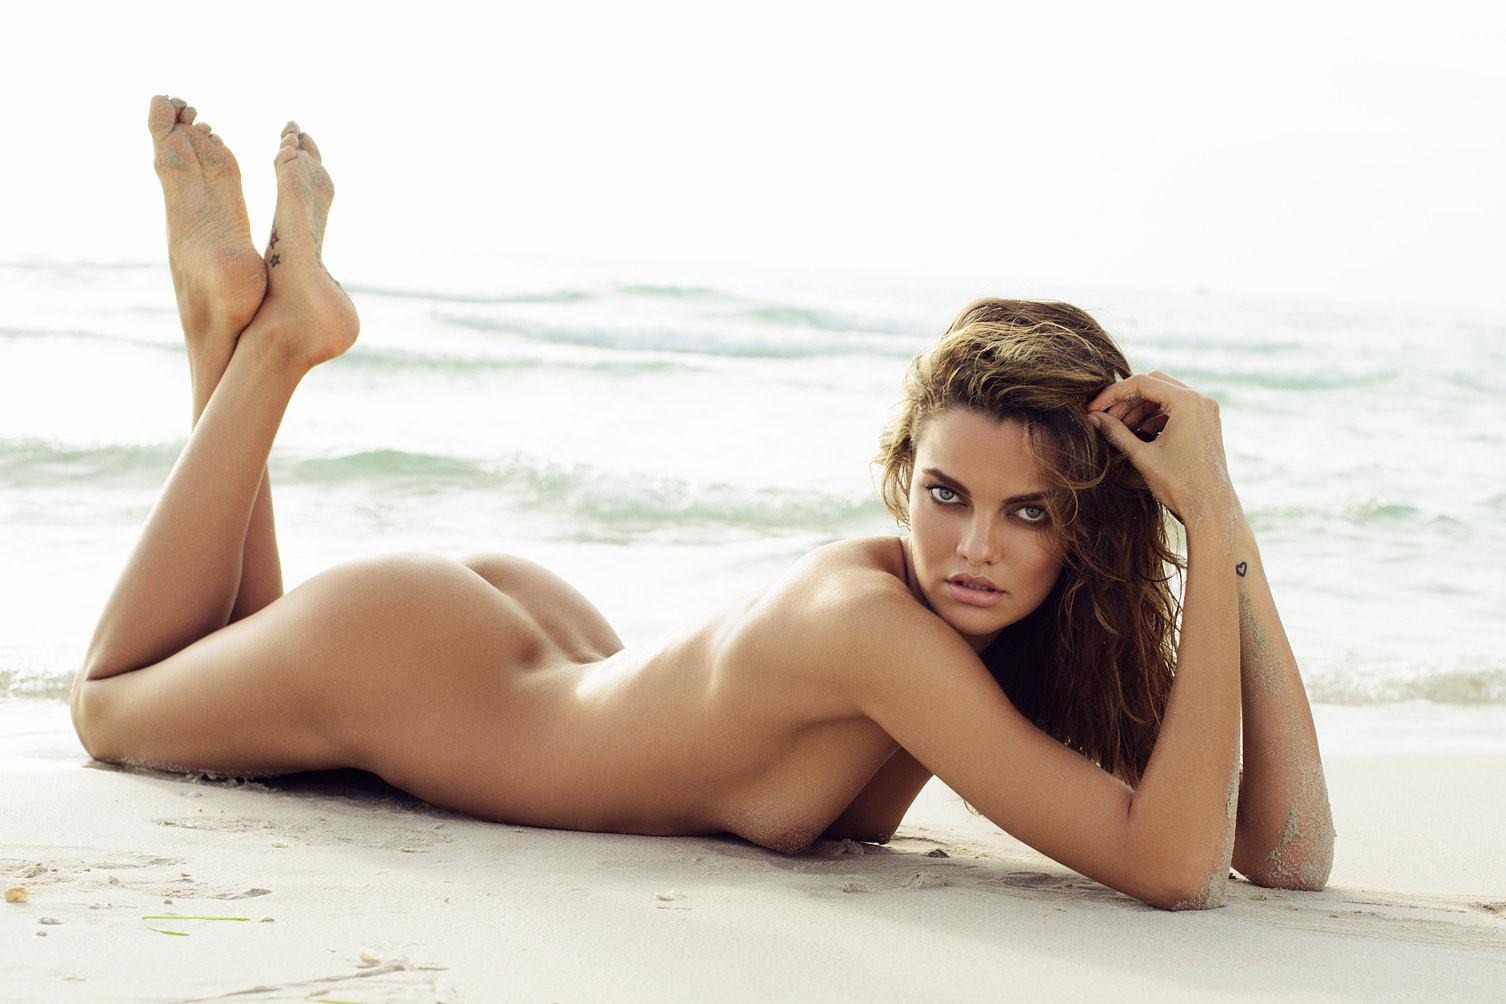 Barbarians girls nude photos erotic thumbs